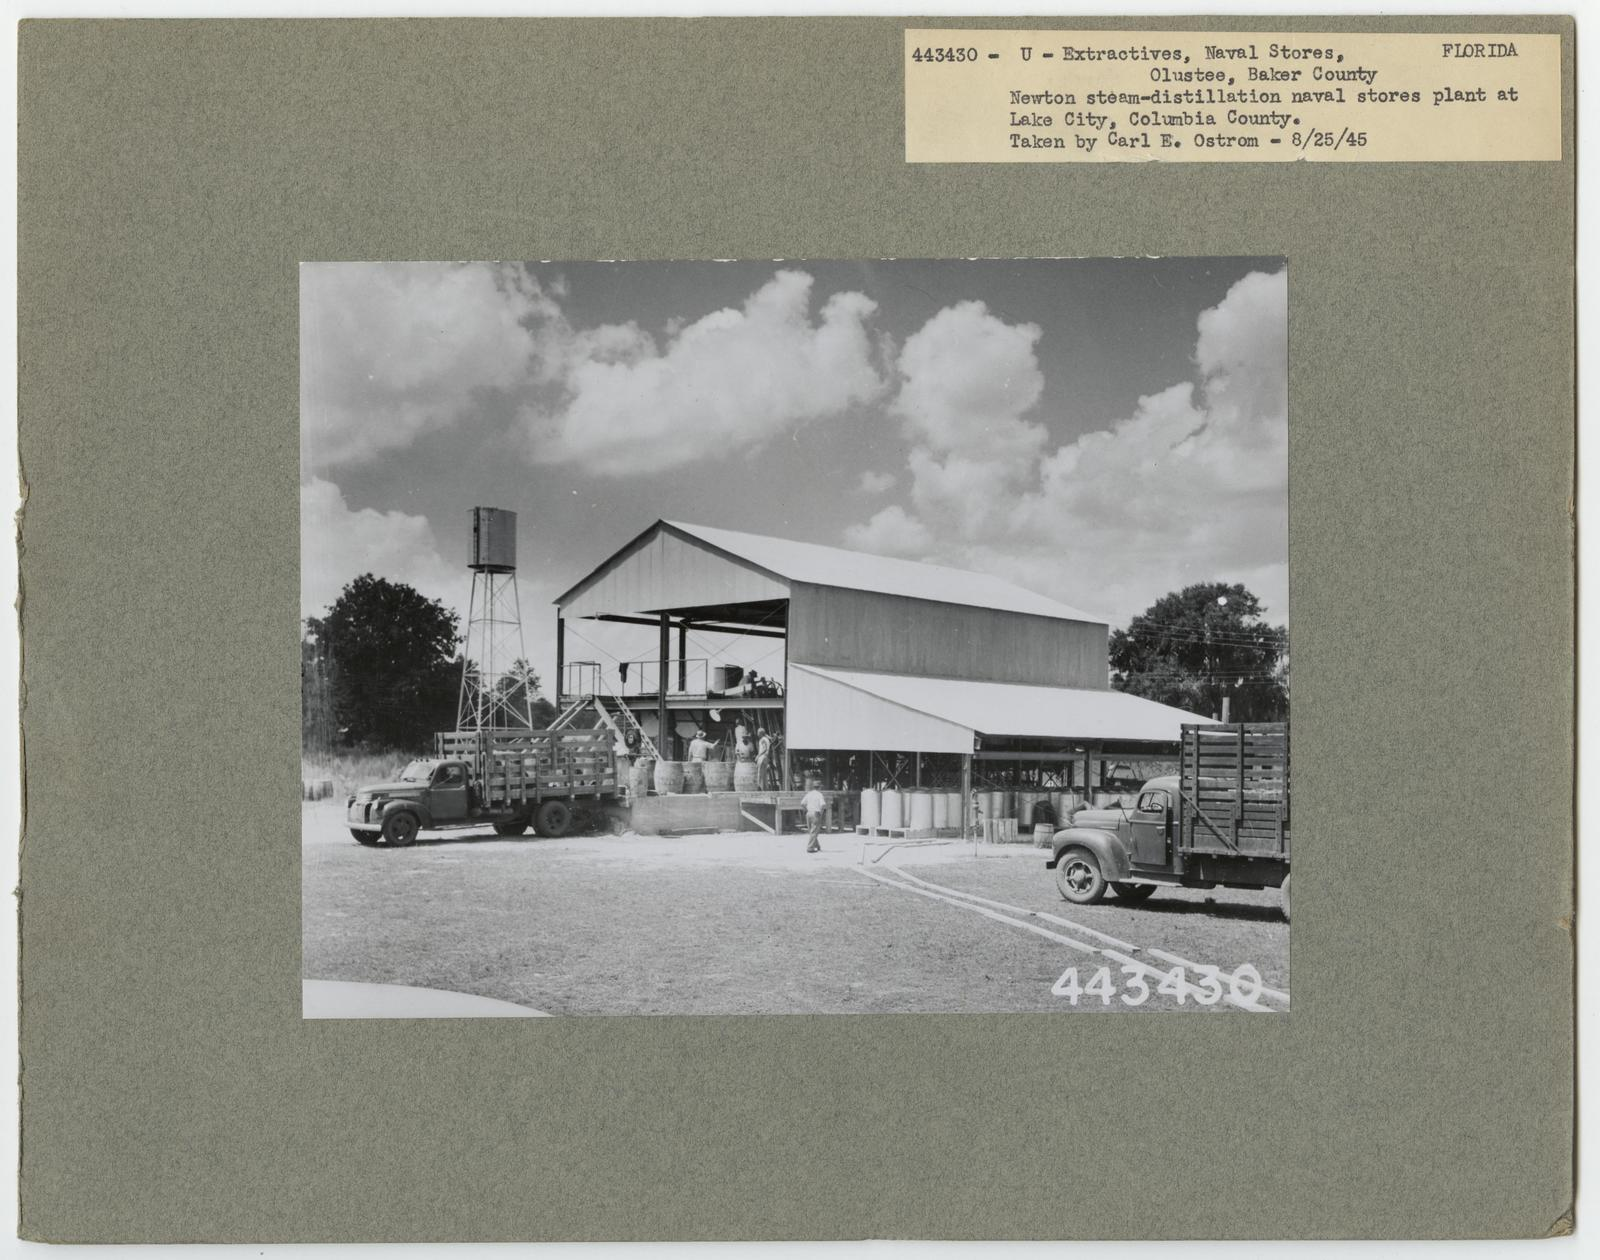 Naval Stores - Florida